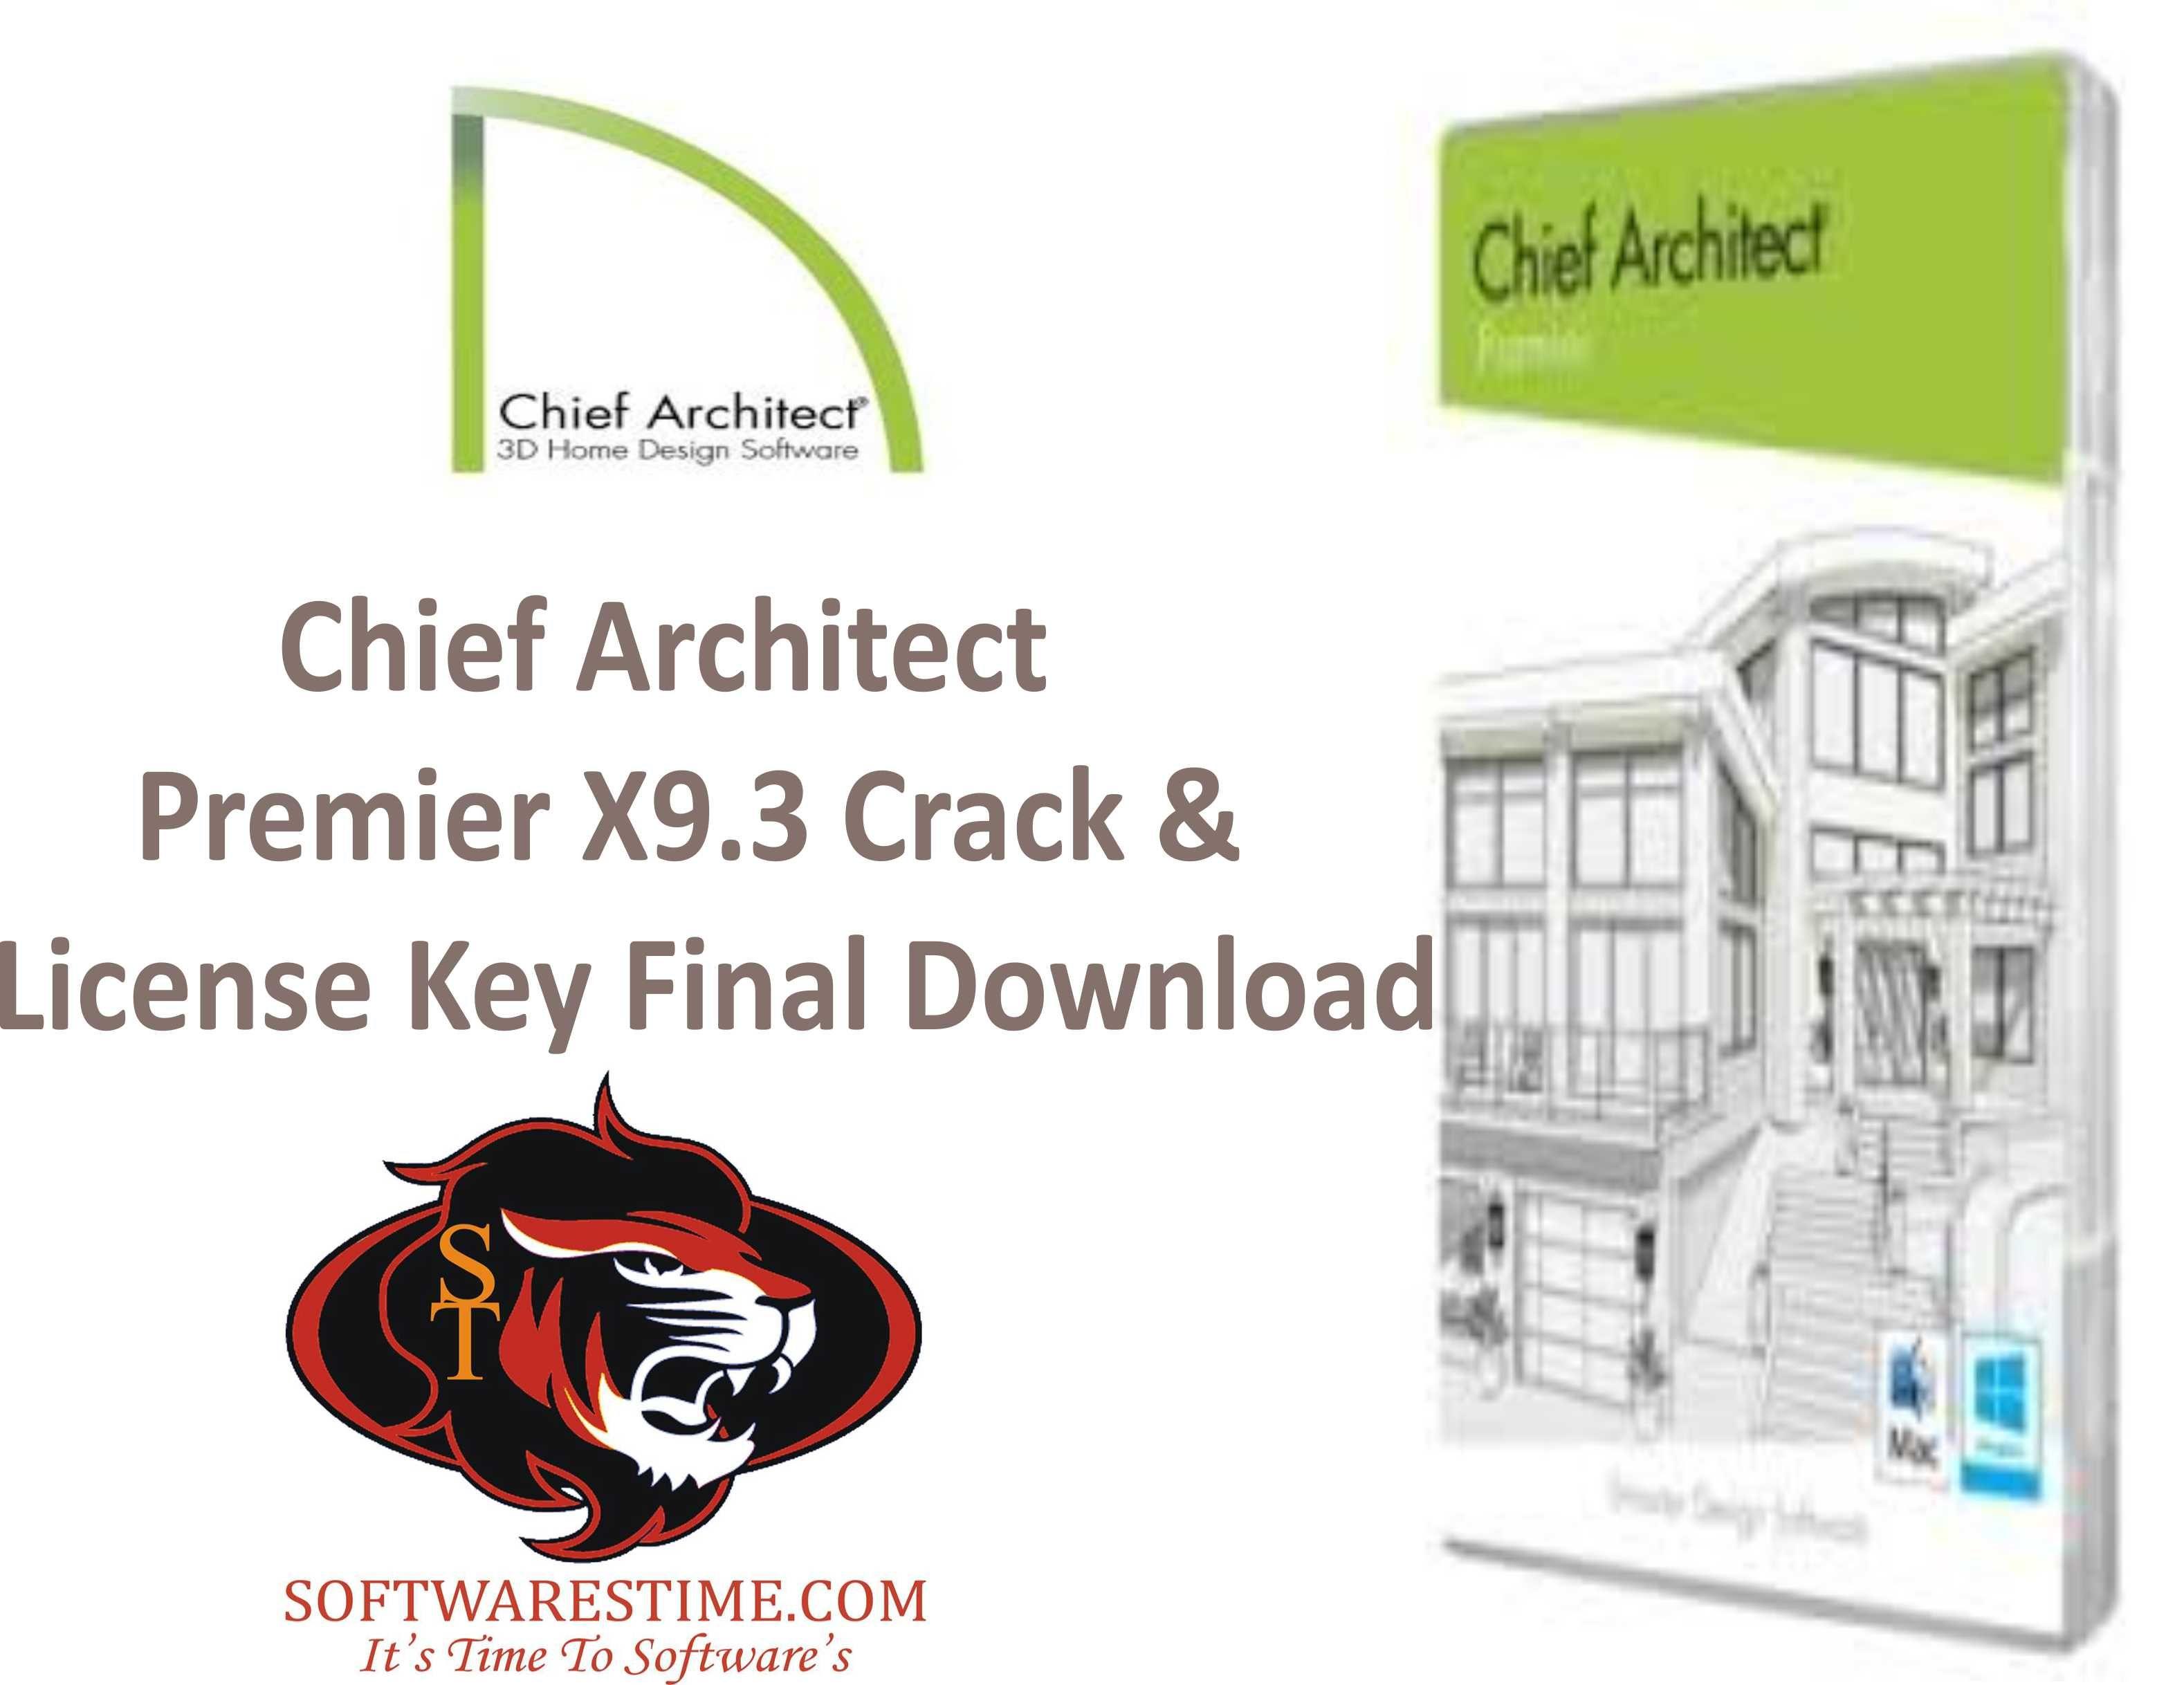 Chief Architect Premier X93 Crack License Key Final